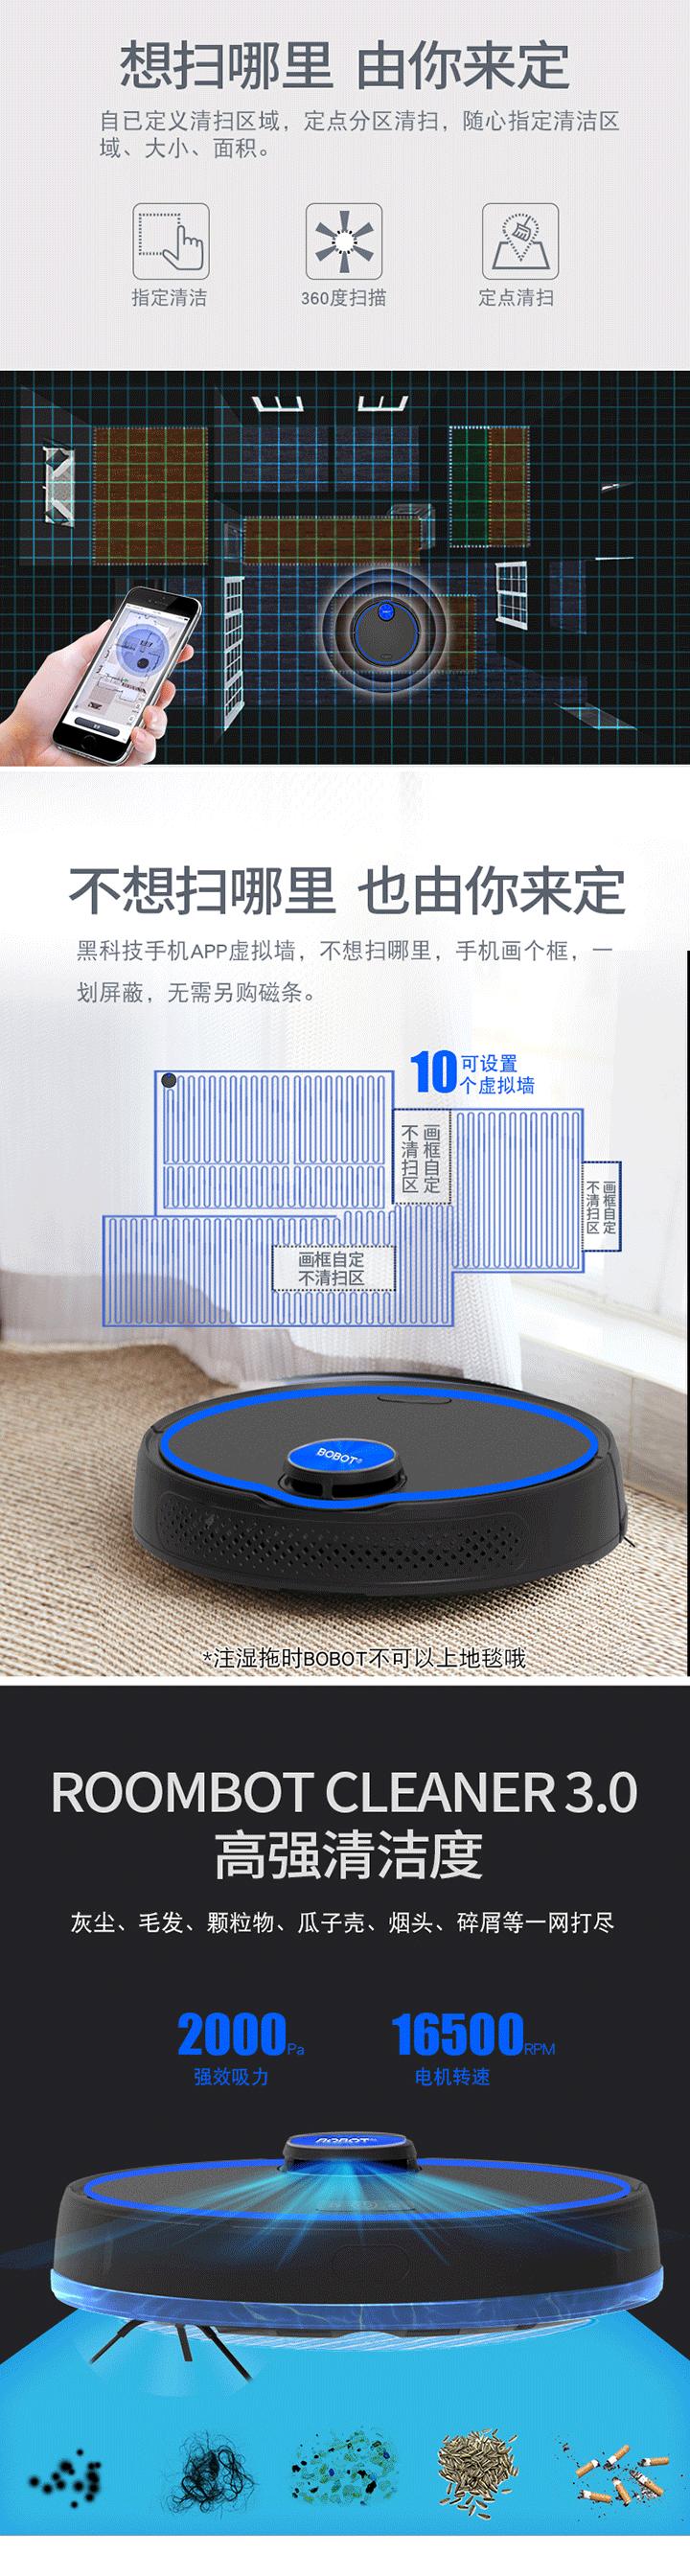 BOBOT扫地机器人免费试用,评测